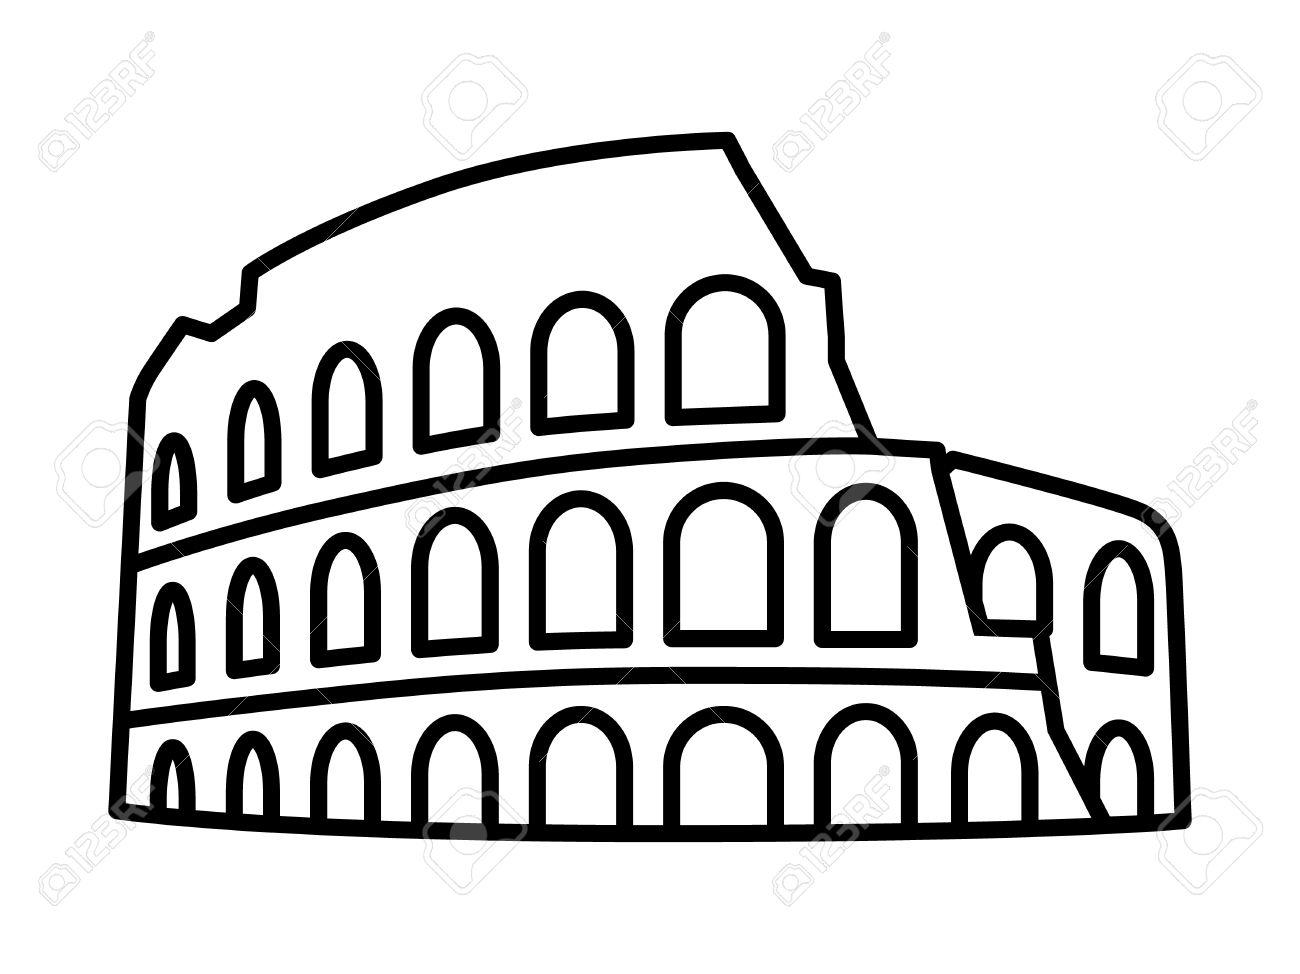 colosseum coliseum in rome italy line art icon for travel apps rh 123rf com